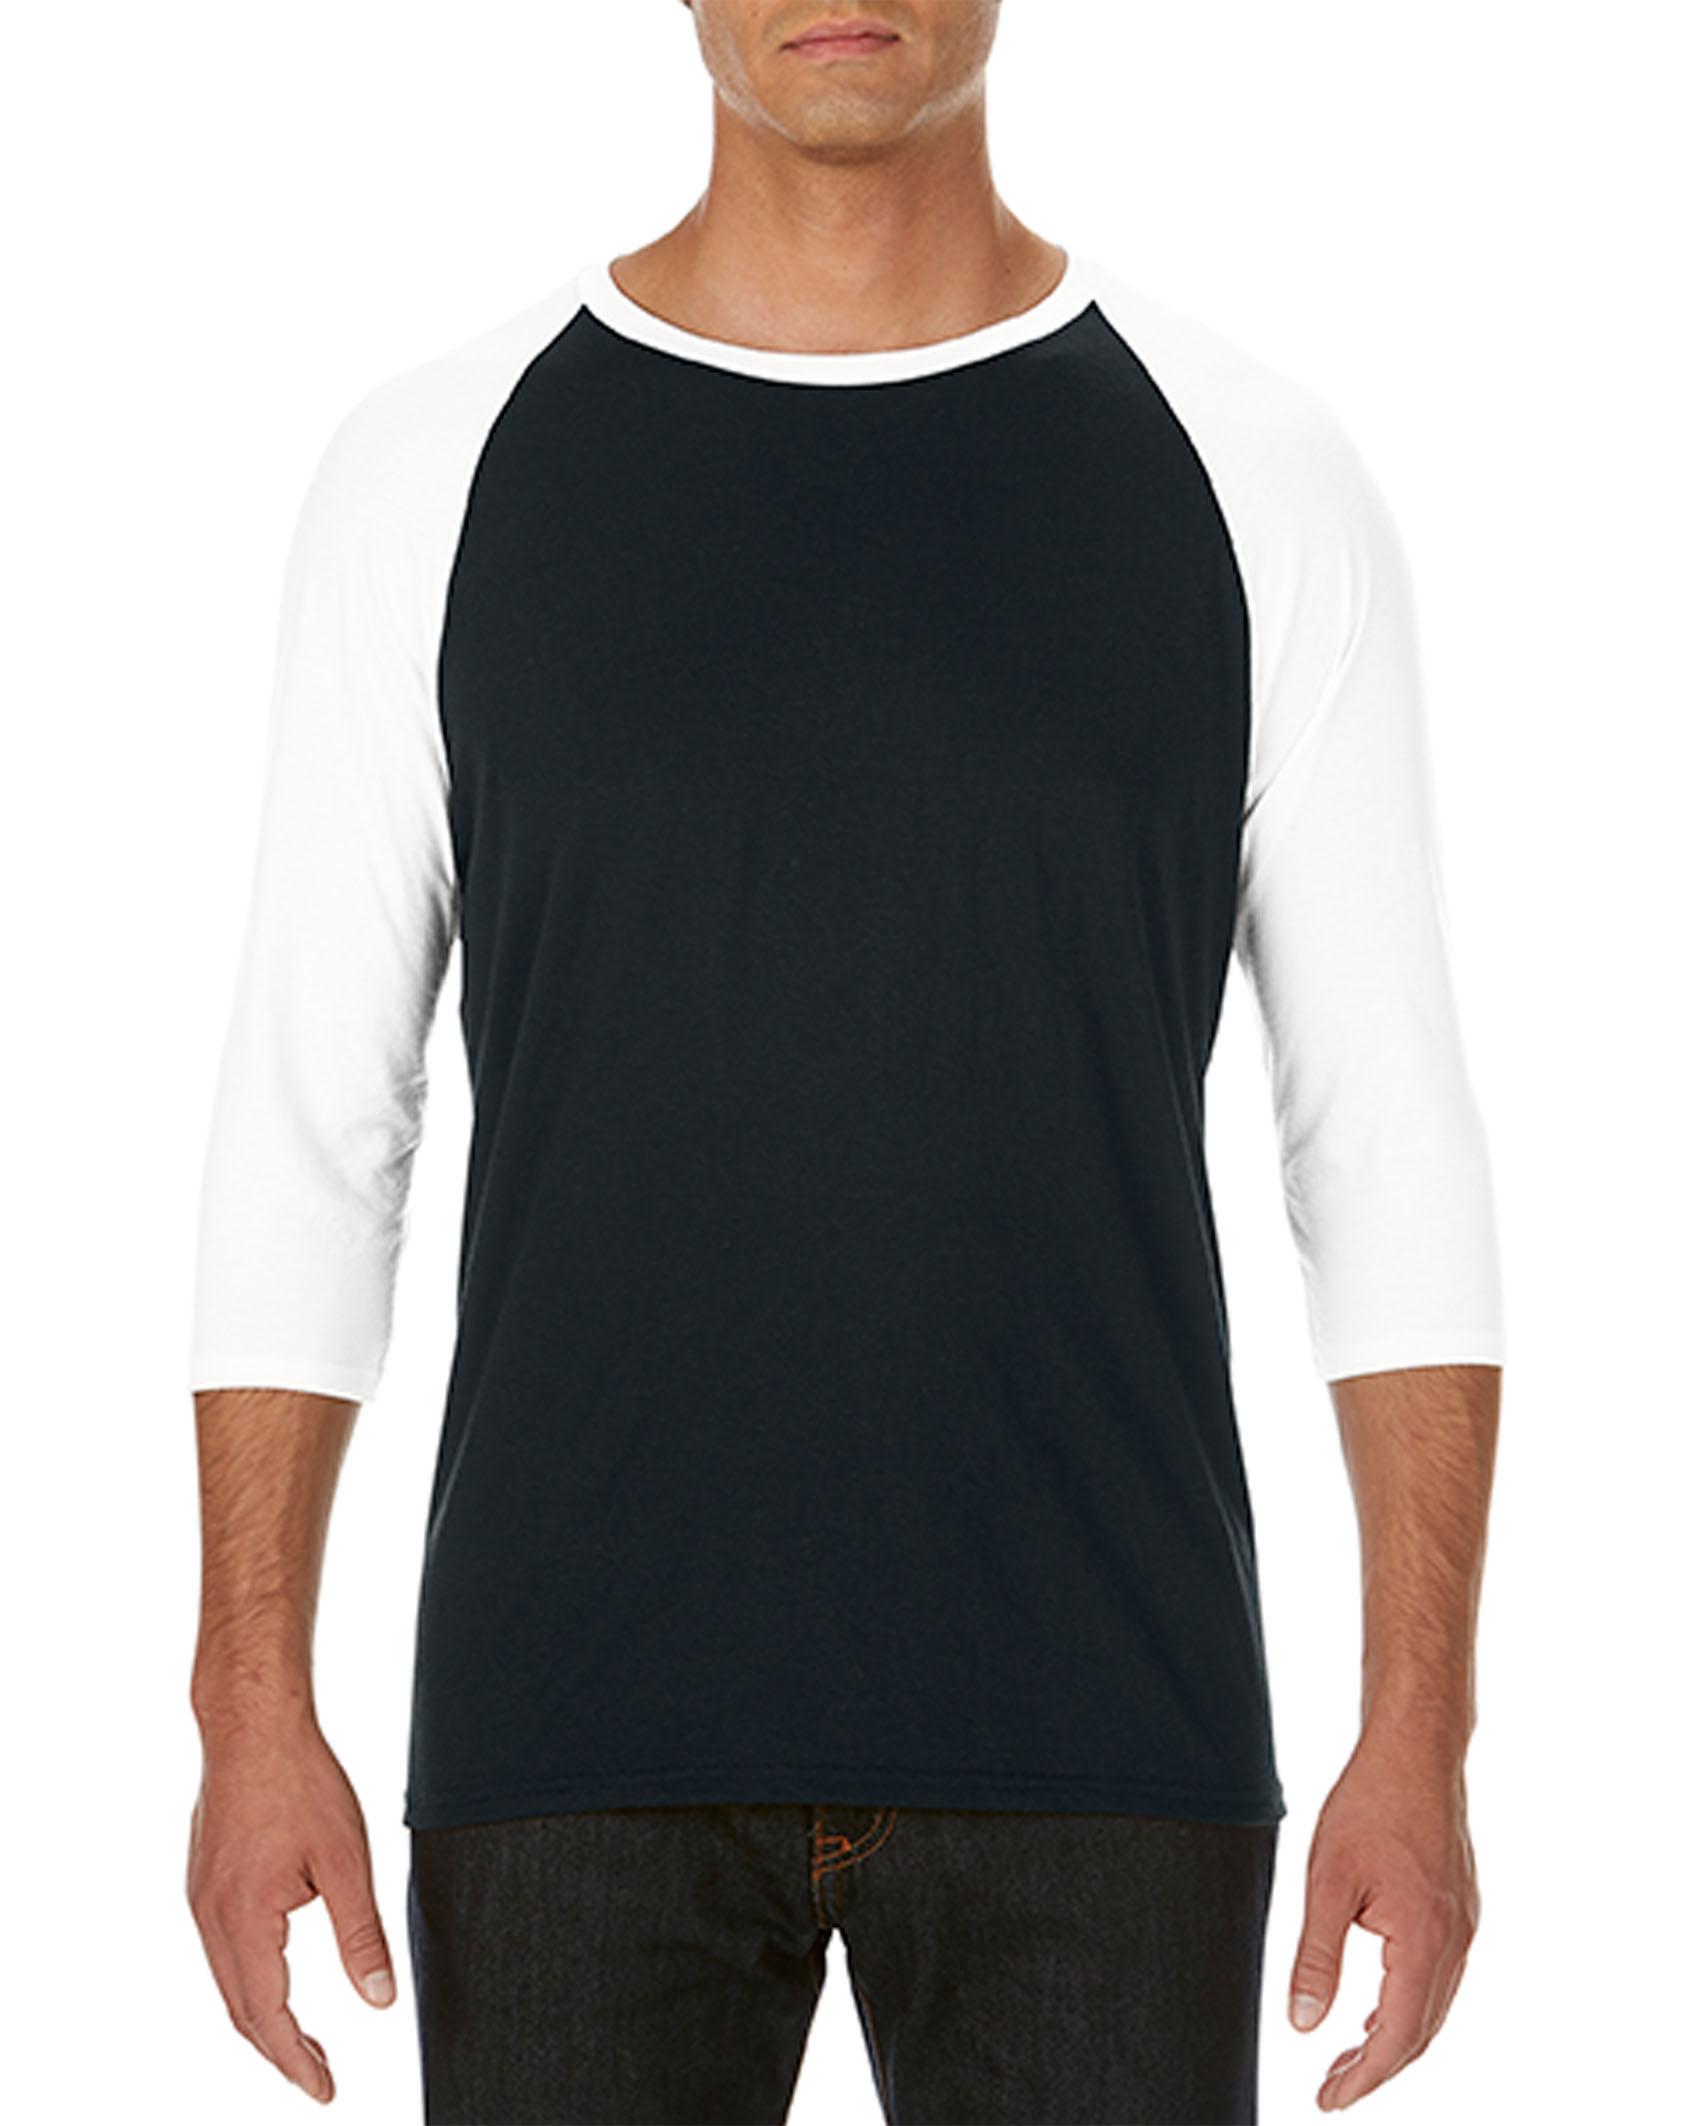 Anvil T-shirt TriBlend 3/4 Raglan Sleeve